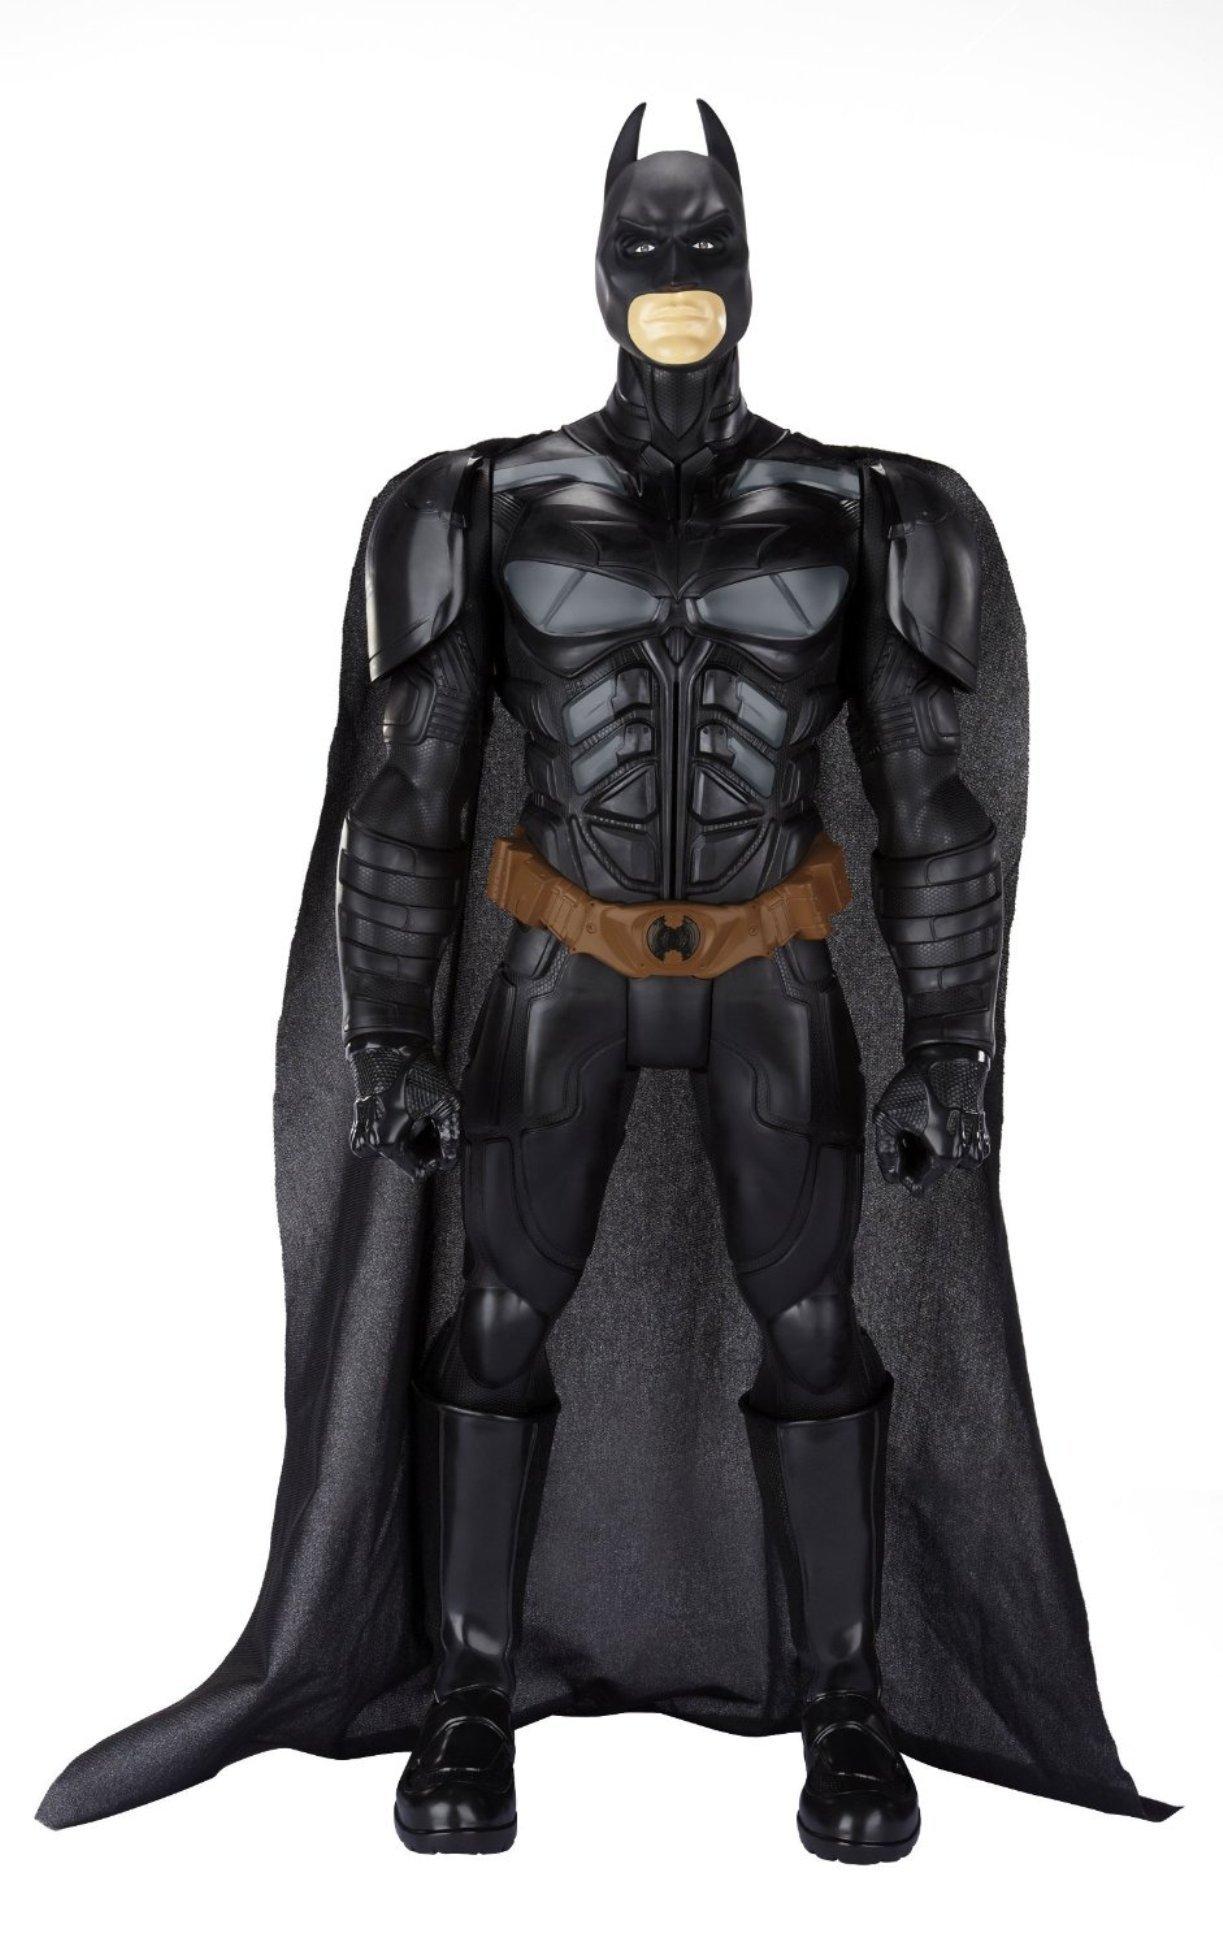 Batman The Dark Knight Rises Batman 31 Inch Action Figure (Ver. 1)